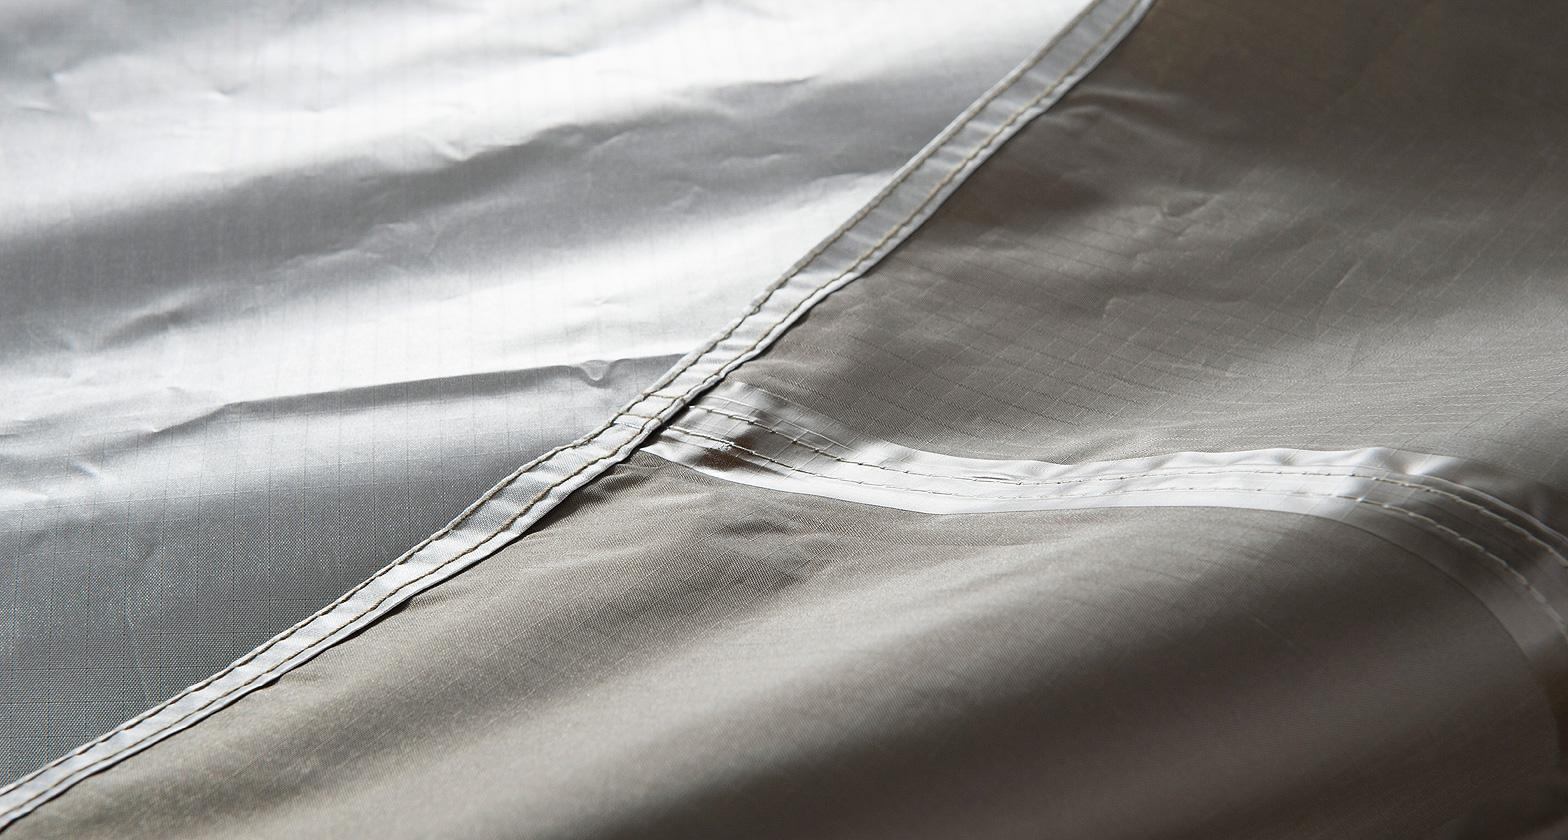 #32117 - Sunseeker 2.5m Fly Extension | Rhino-Rack